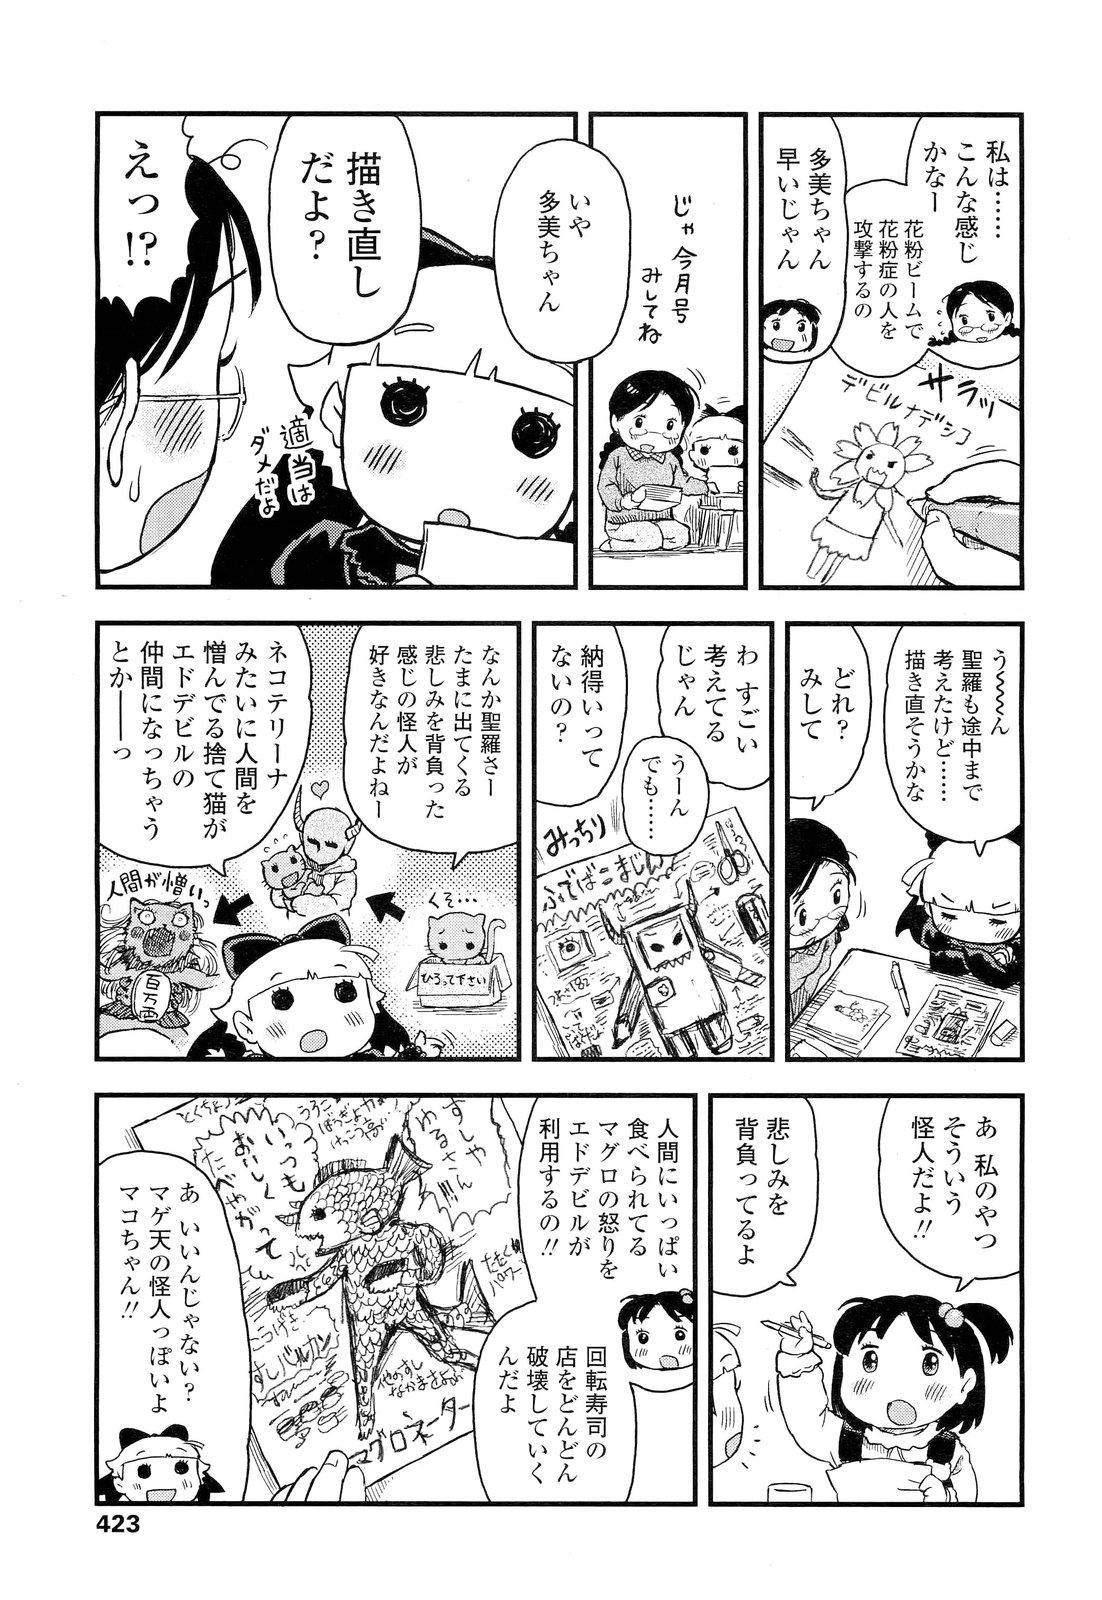 COMIC LO 2012-05 Vol. 98 422